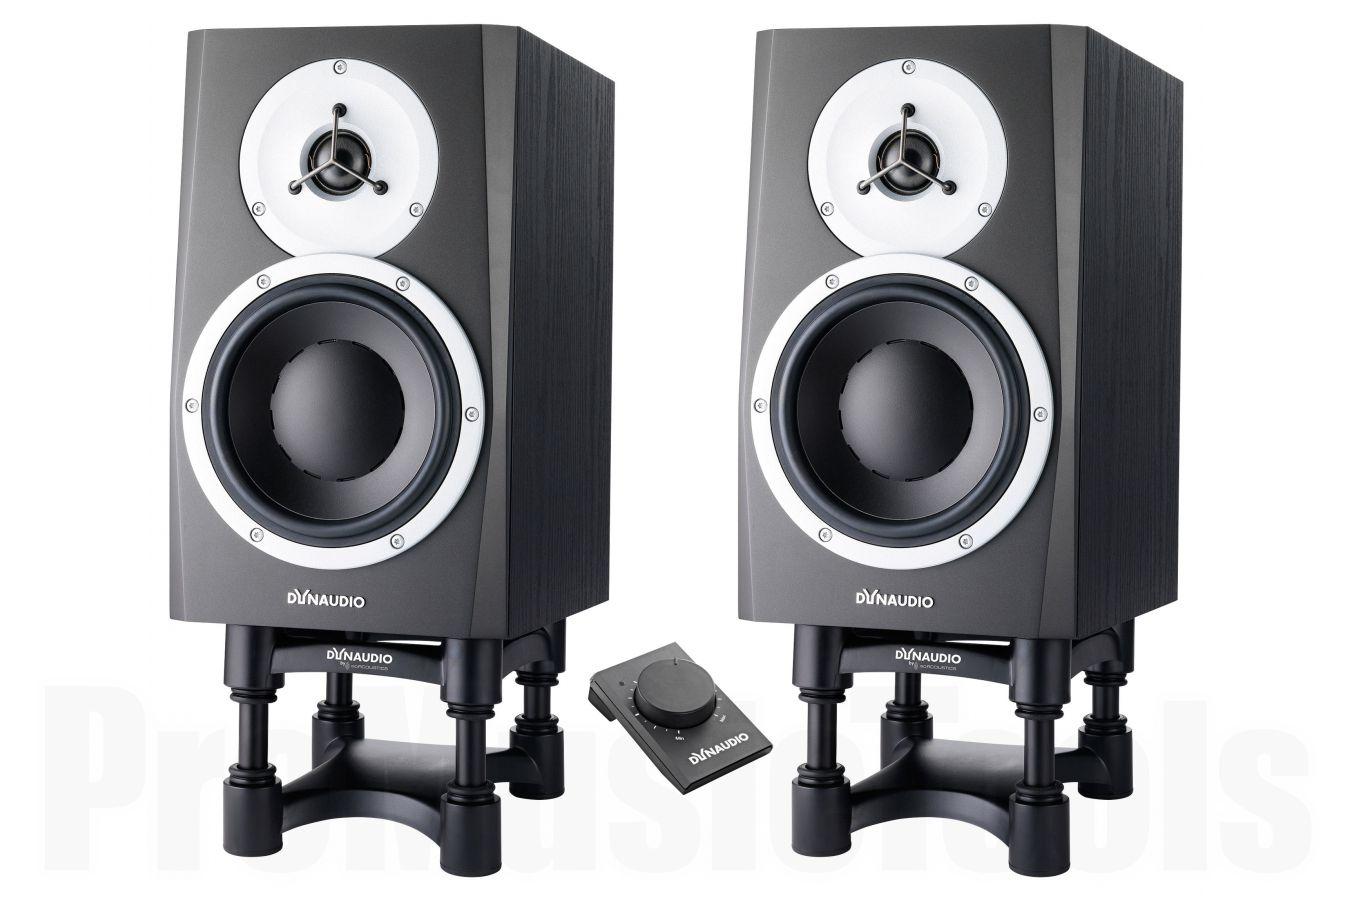 Dynaudio BM5 mkIII - PAIR BUNDLE SET (incl. 2x ISO-L8R155 & Dynaudio Volume Box)